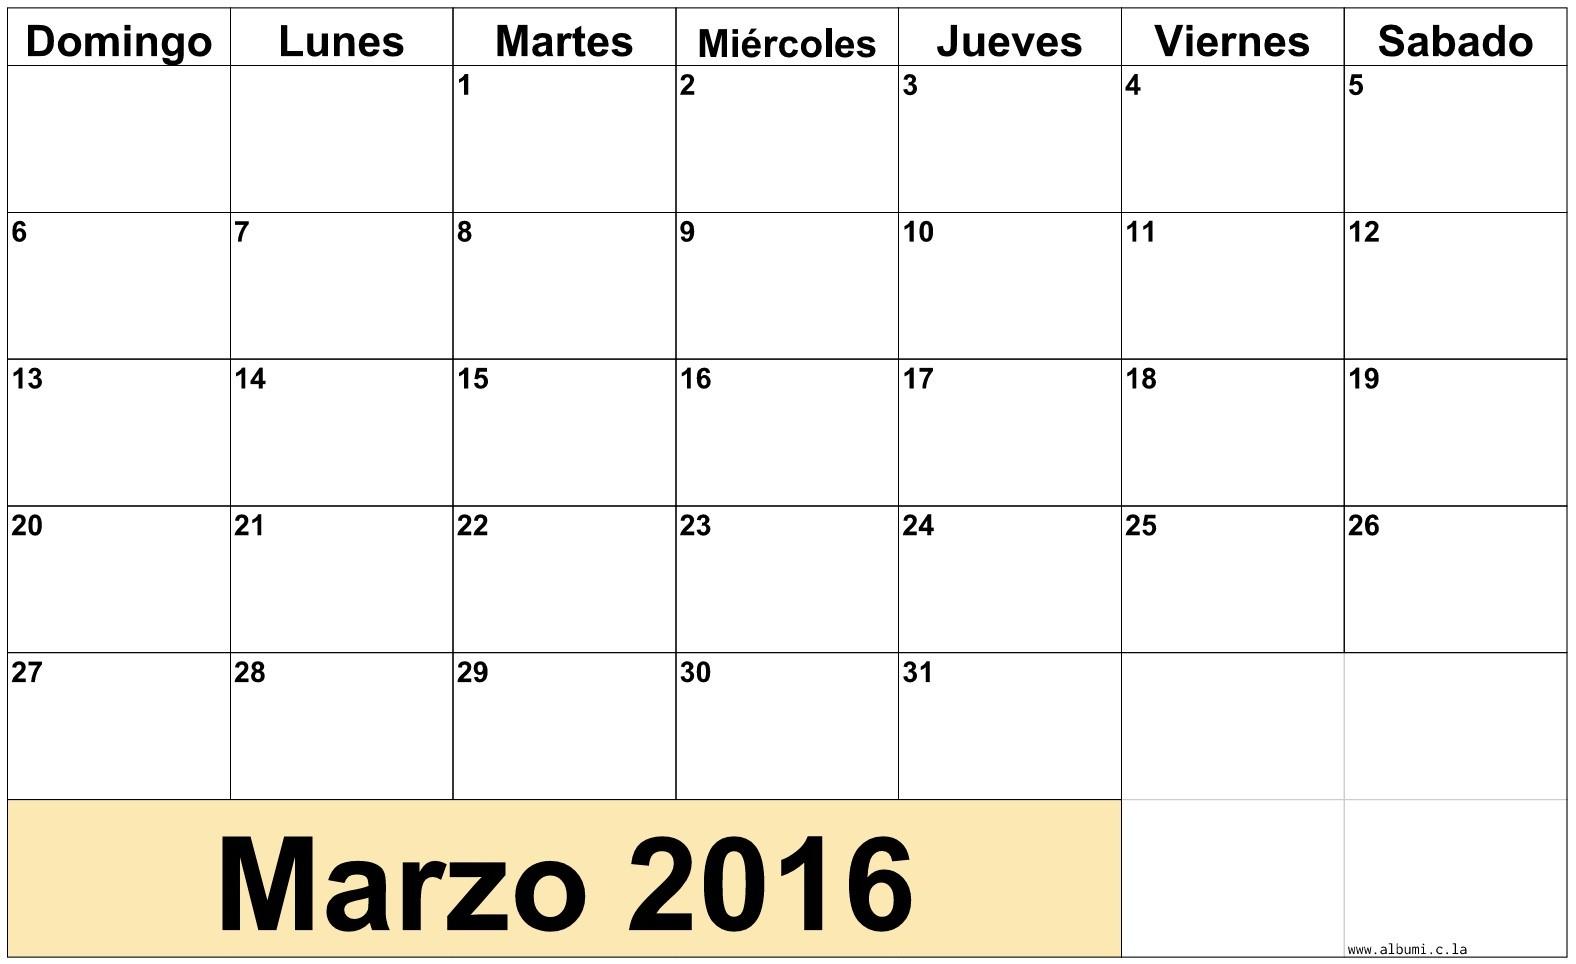 Calendario Mensual Março 2016 para imprimir gratis